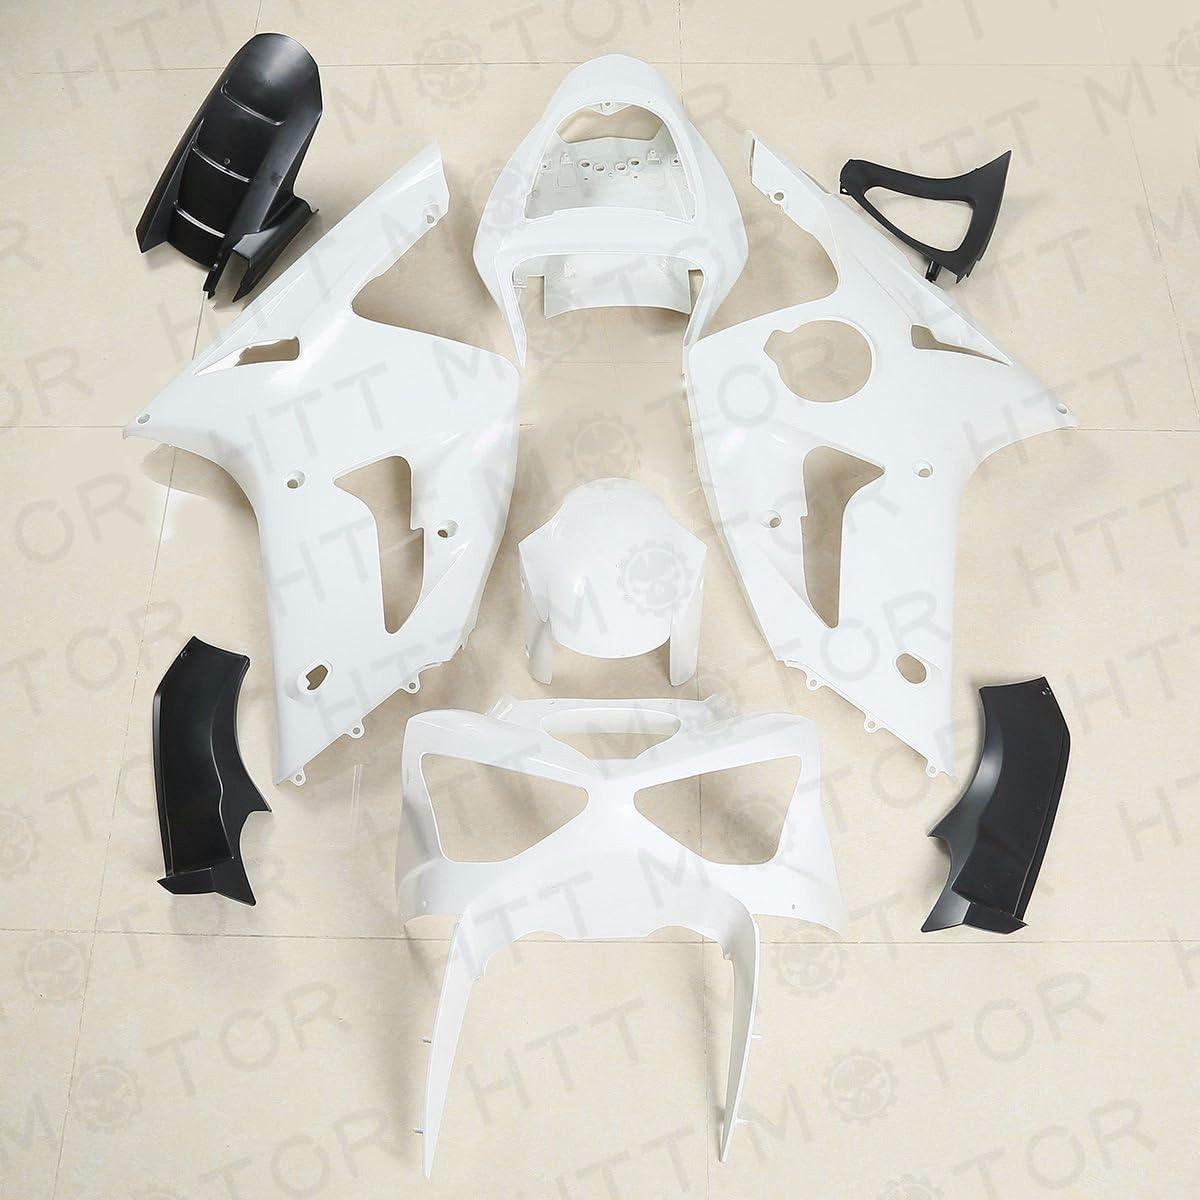 Unpainted ABS Fairing Kit Fit For Kawasaki Ninja ZX-6R 2003-2004 Bodywork 03-04